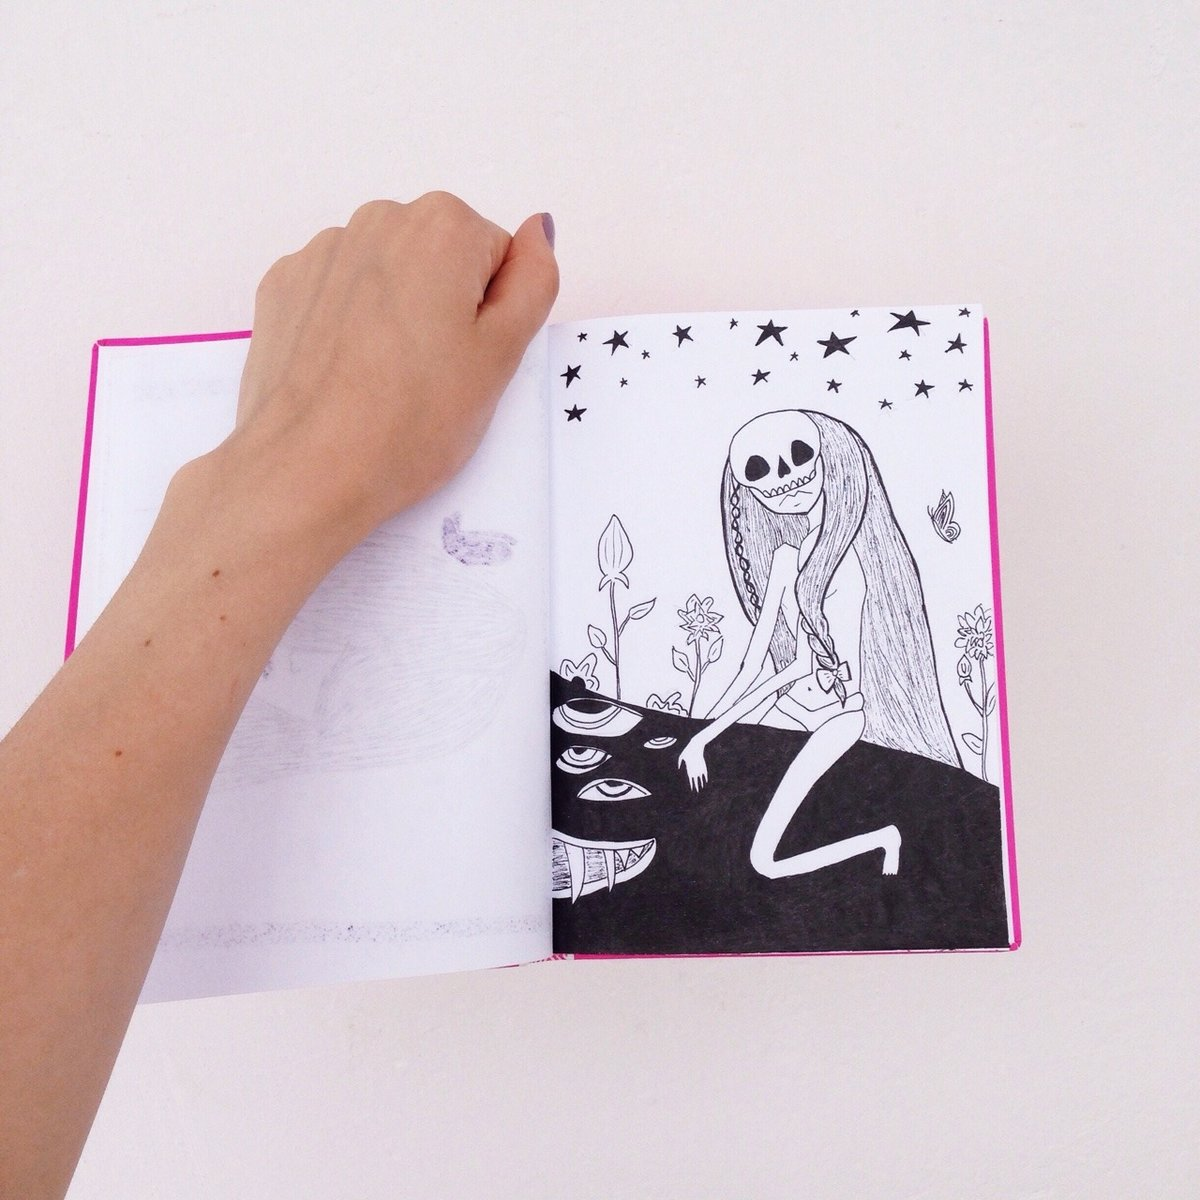 Картинки рисунок в скетчбуке